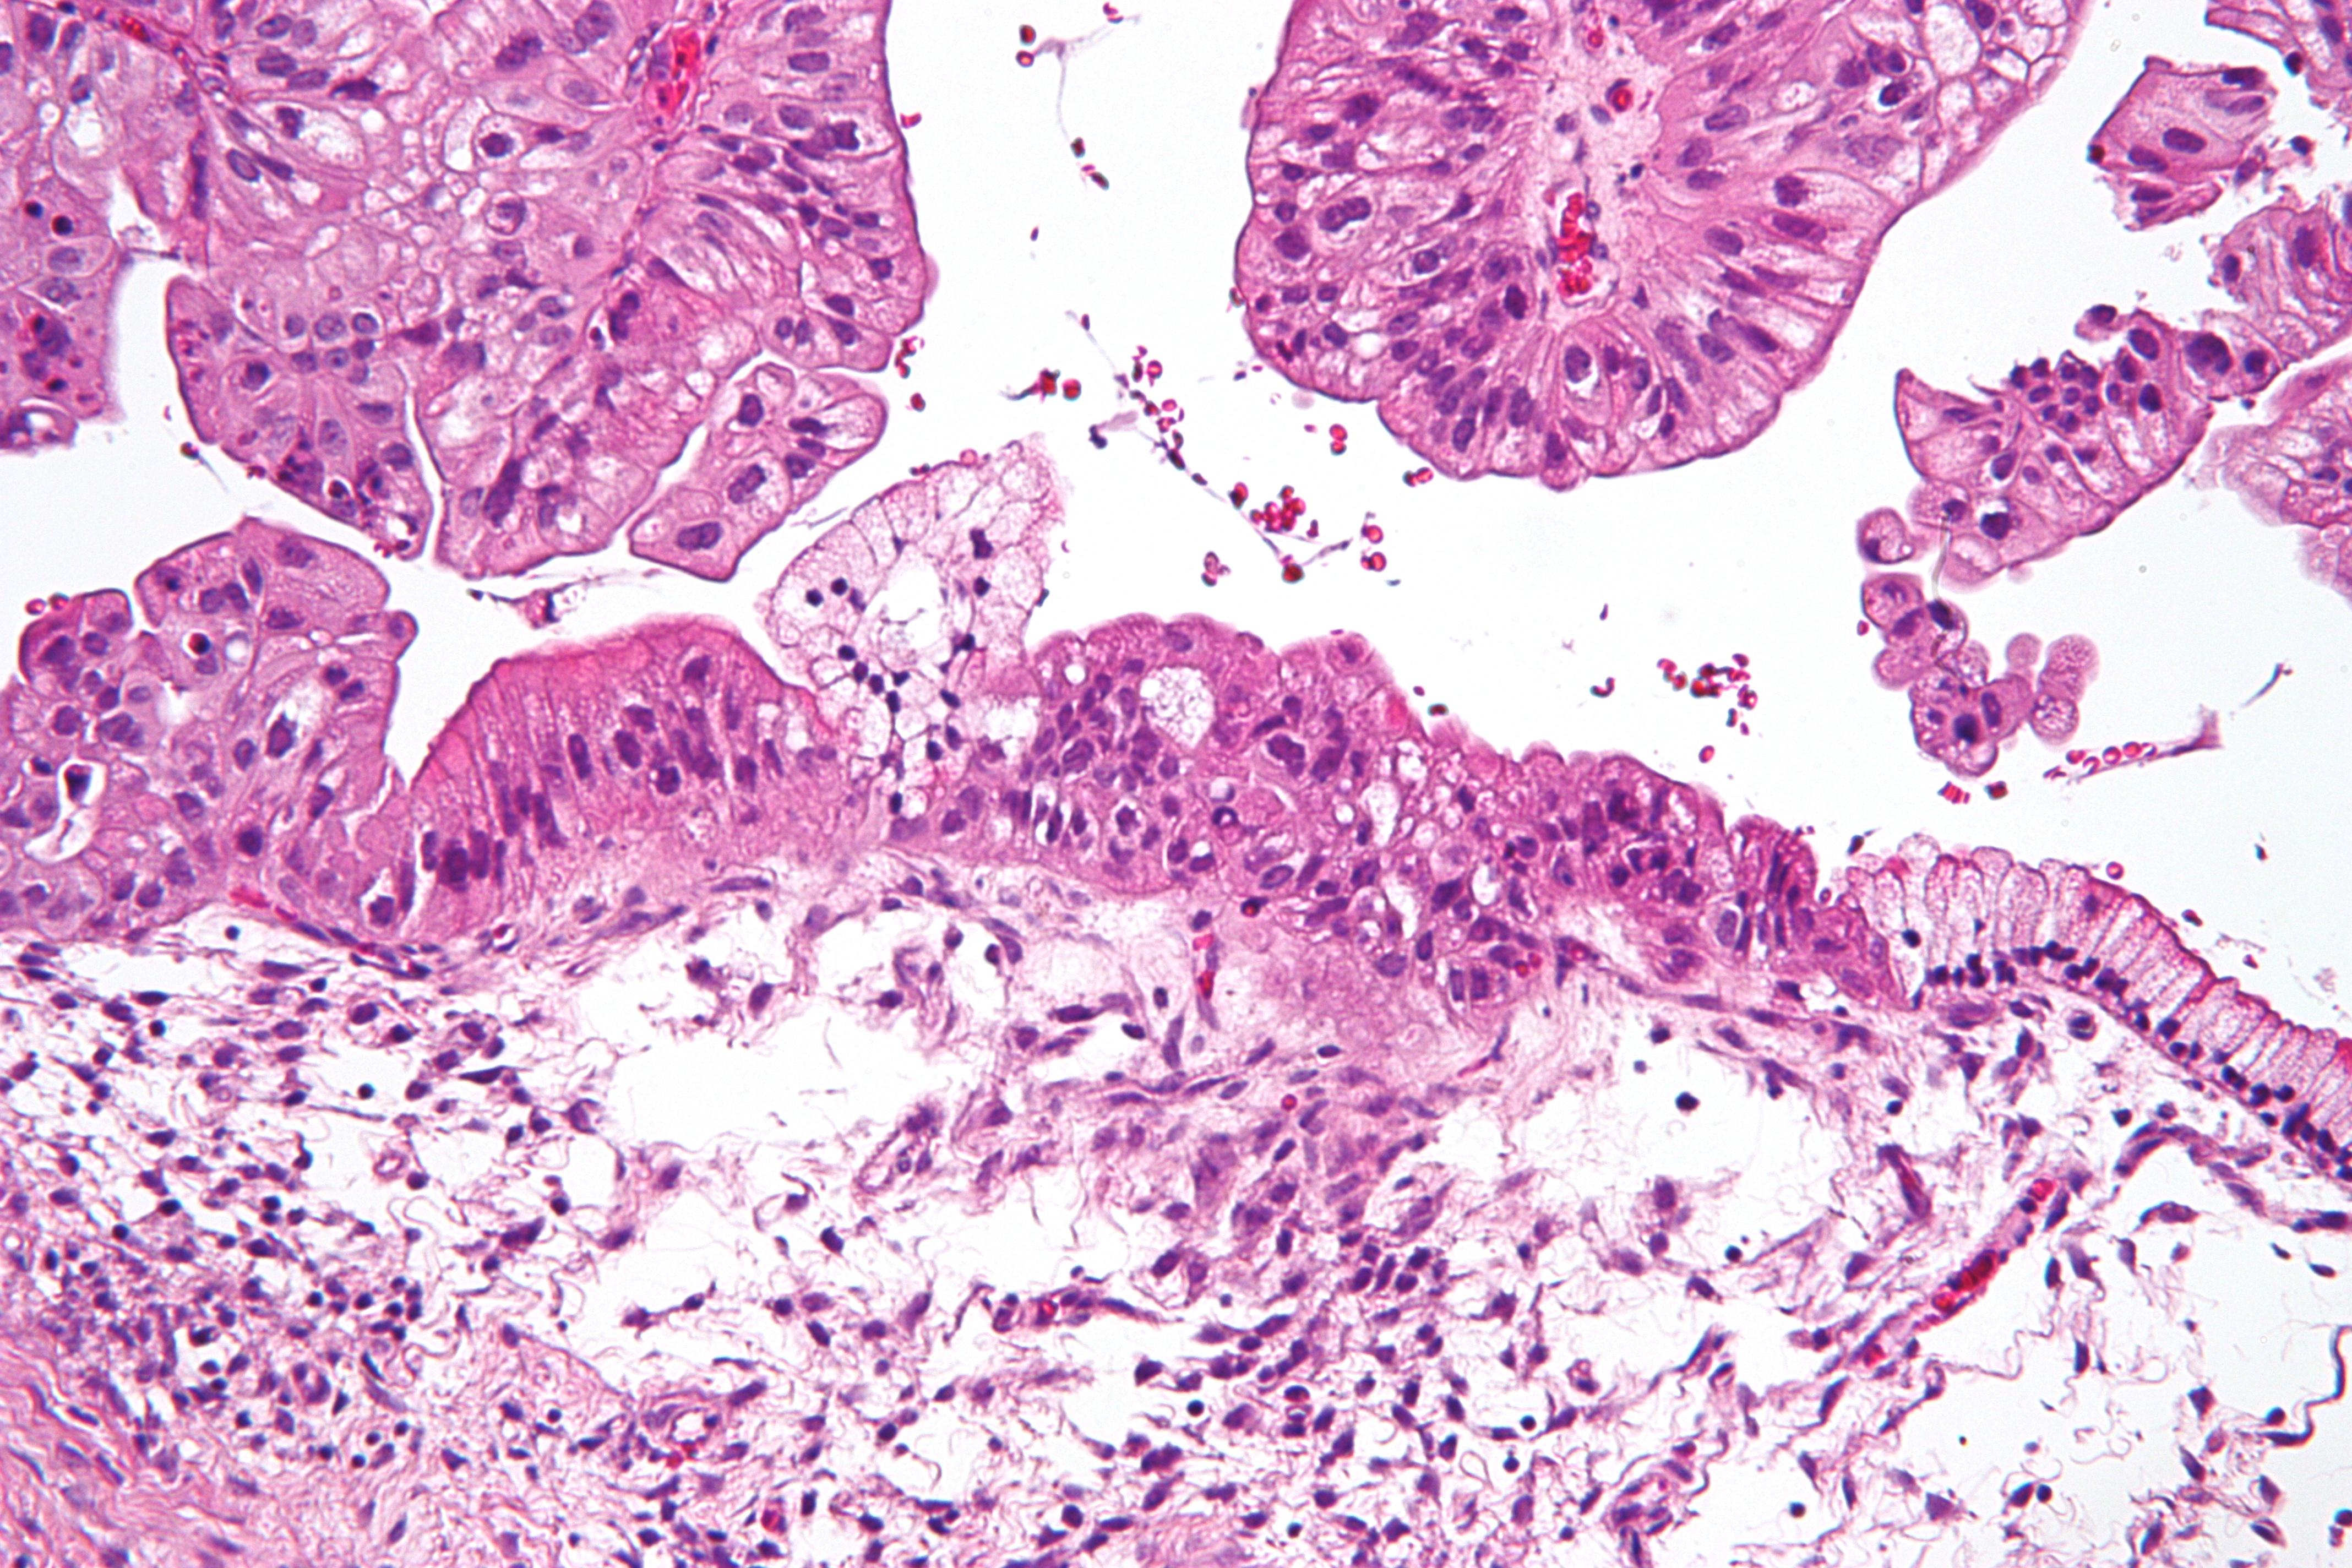 Cancer mamar mucinos. Tipuri de cancer mamar, simptome și tratament